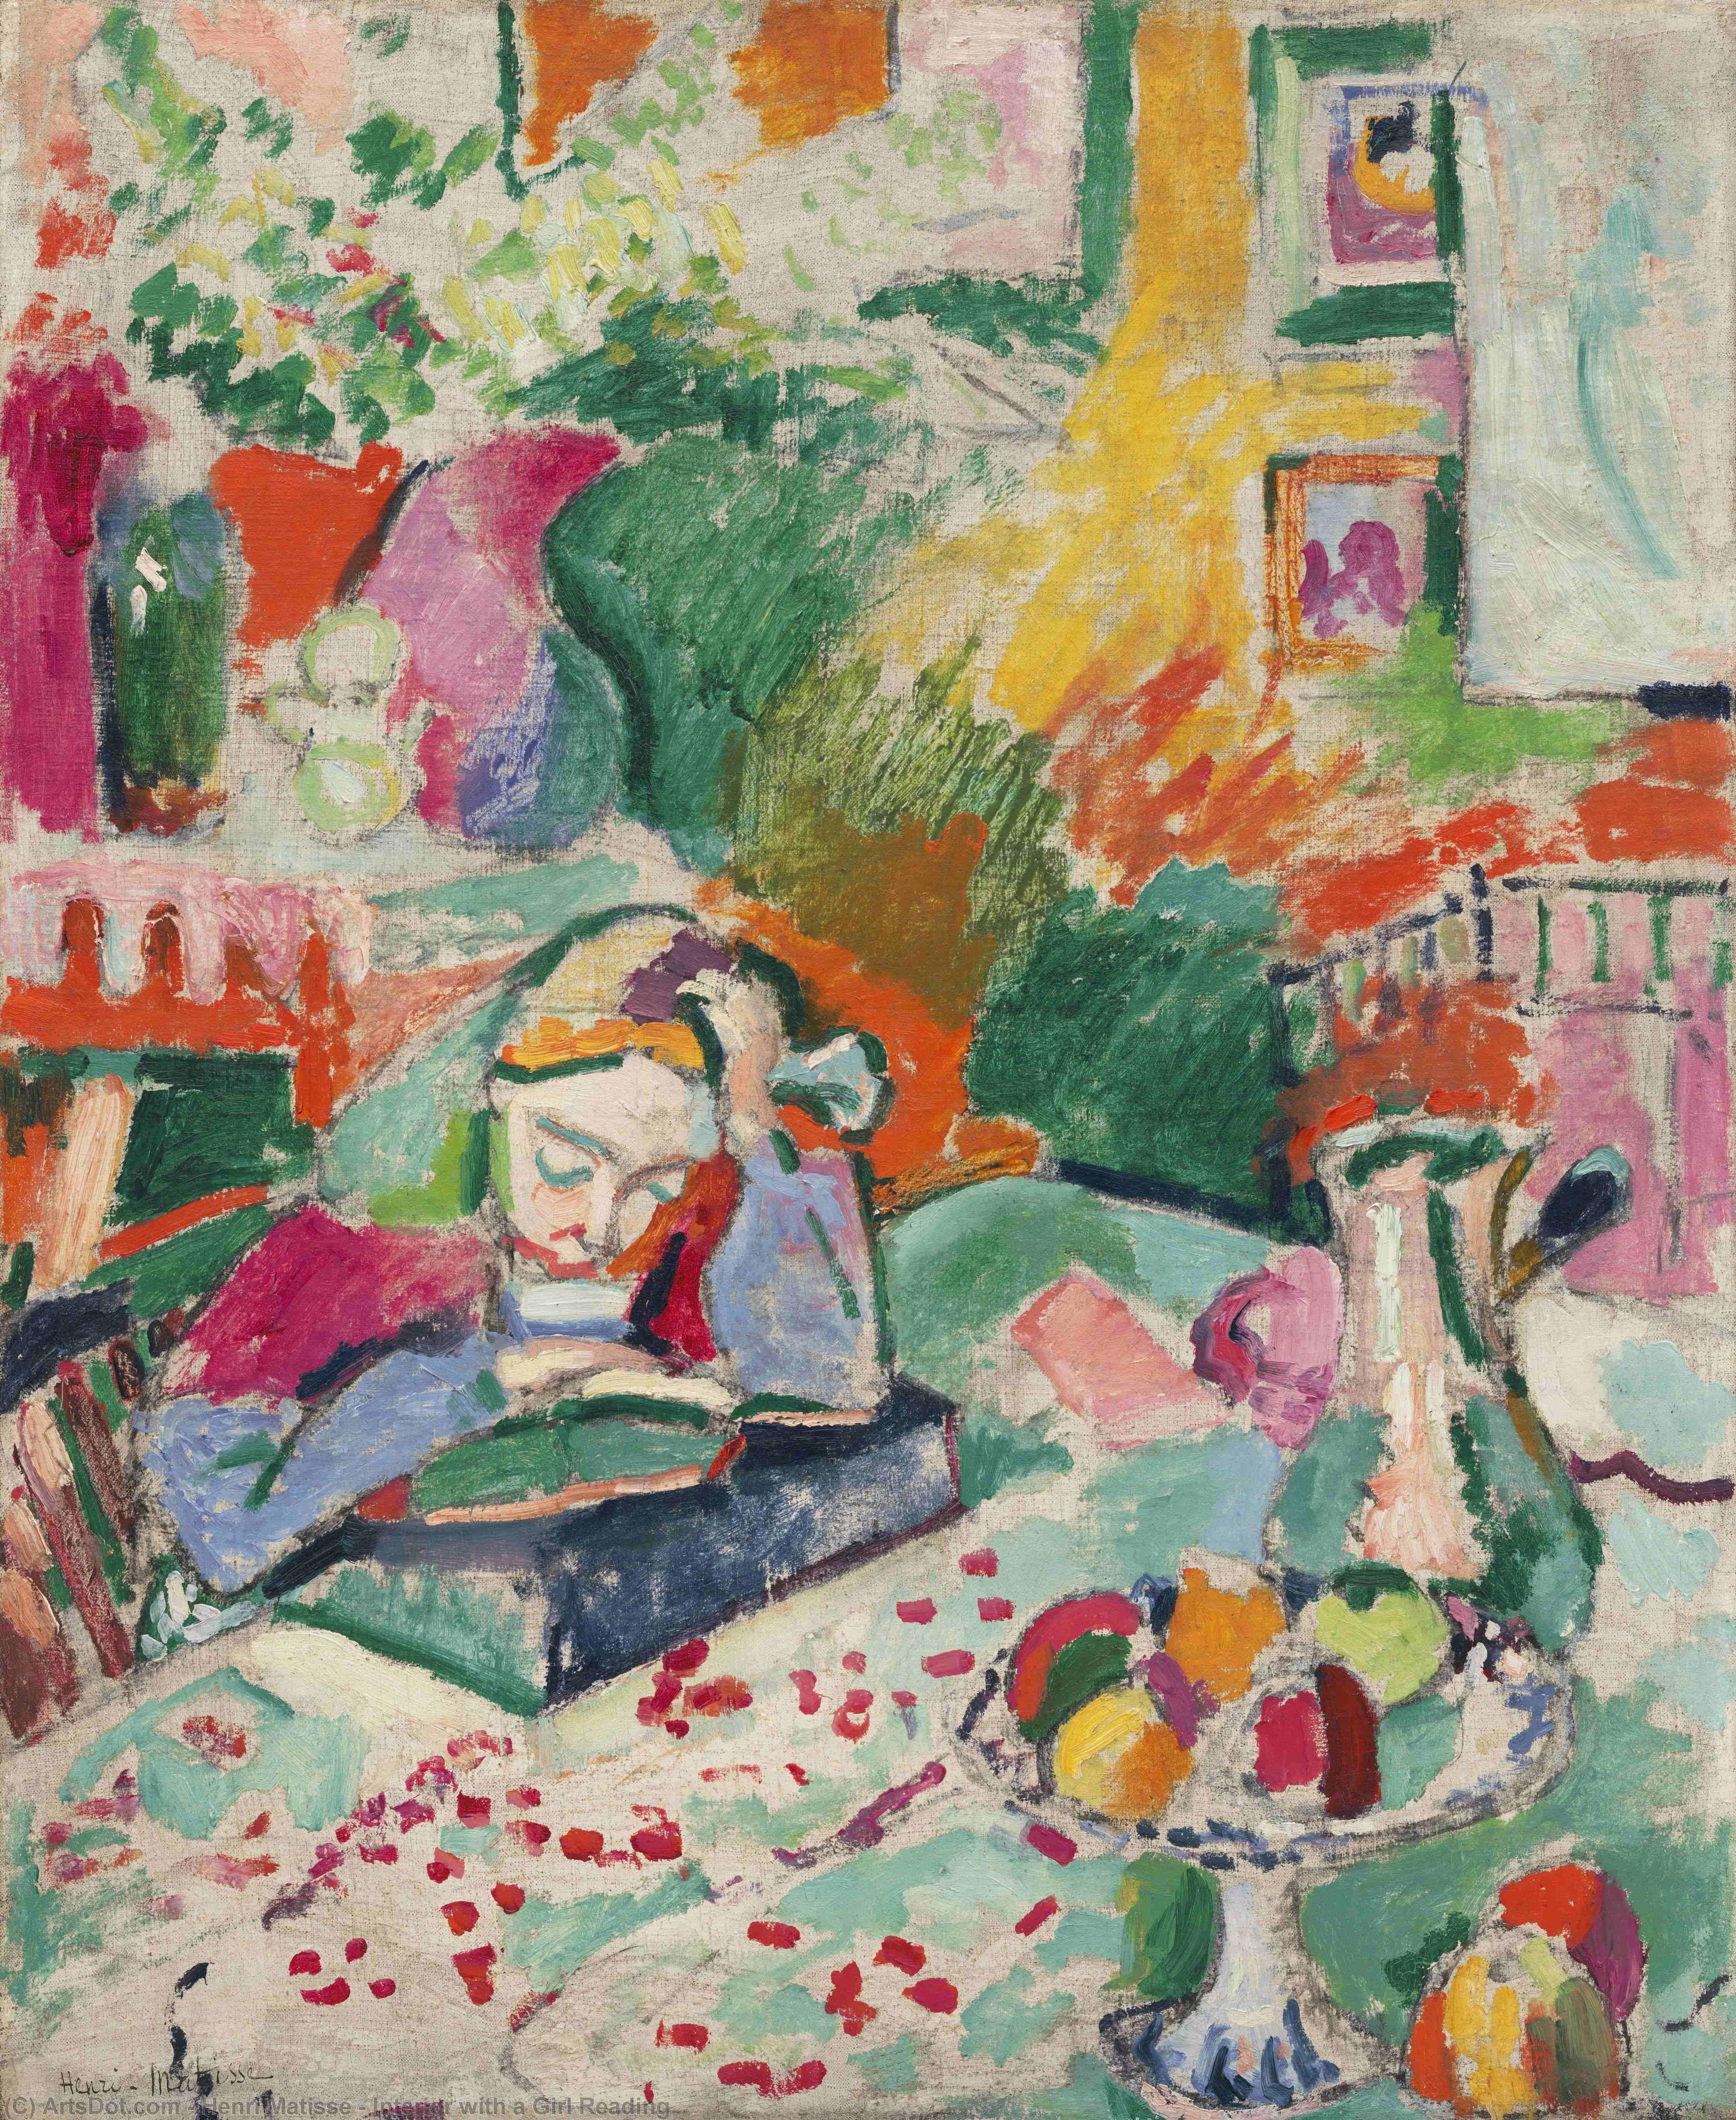 Interior with a Girl Reading, 1905 by Henri Matisse (1869-1954, France) |  | ArtsDot.com